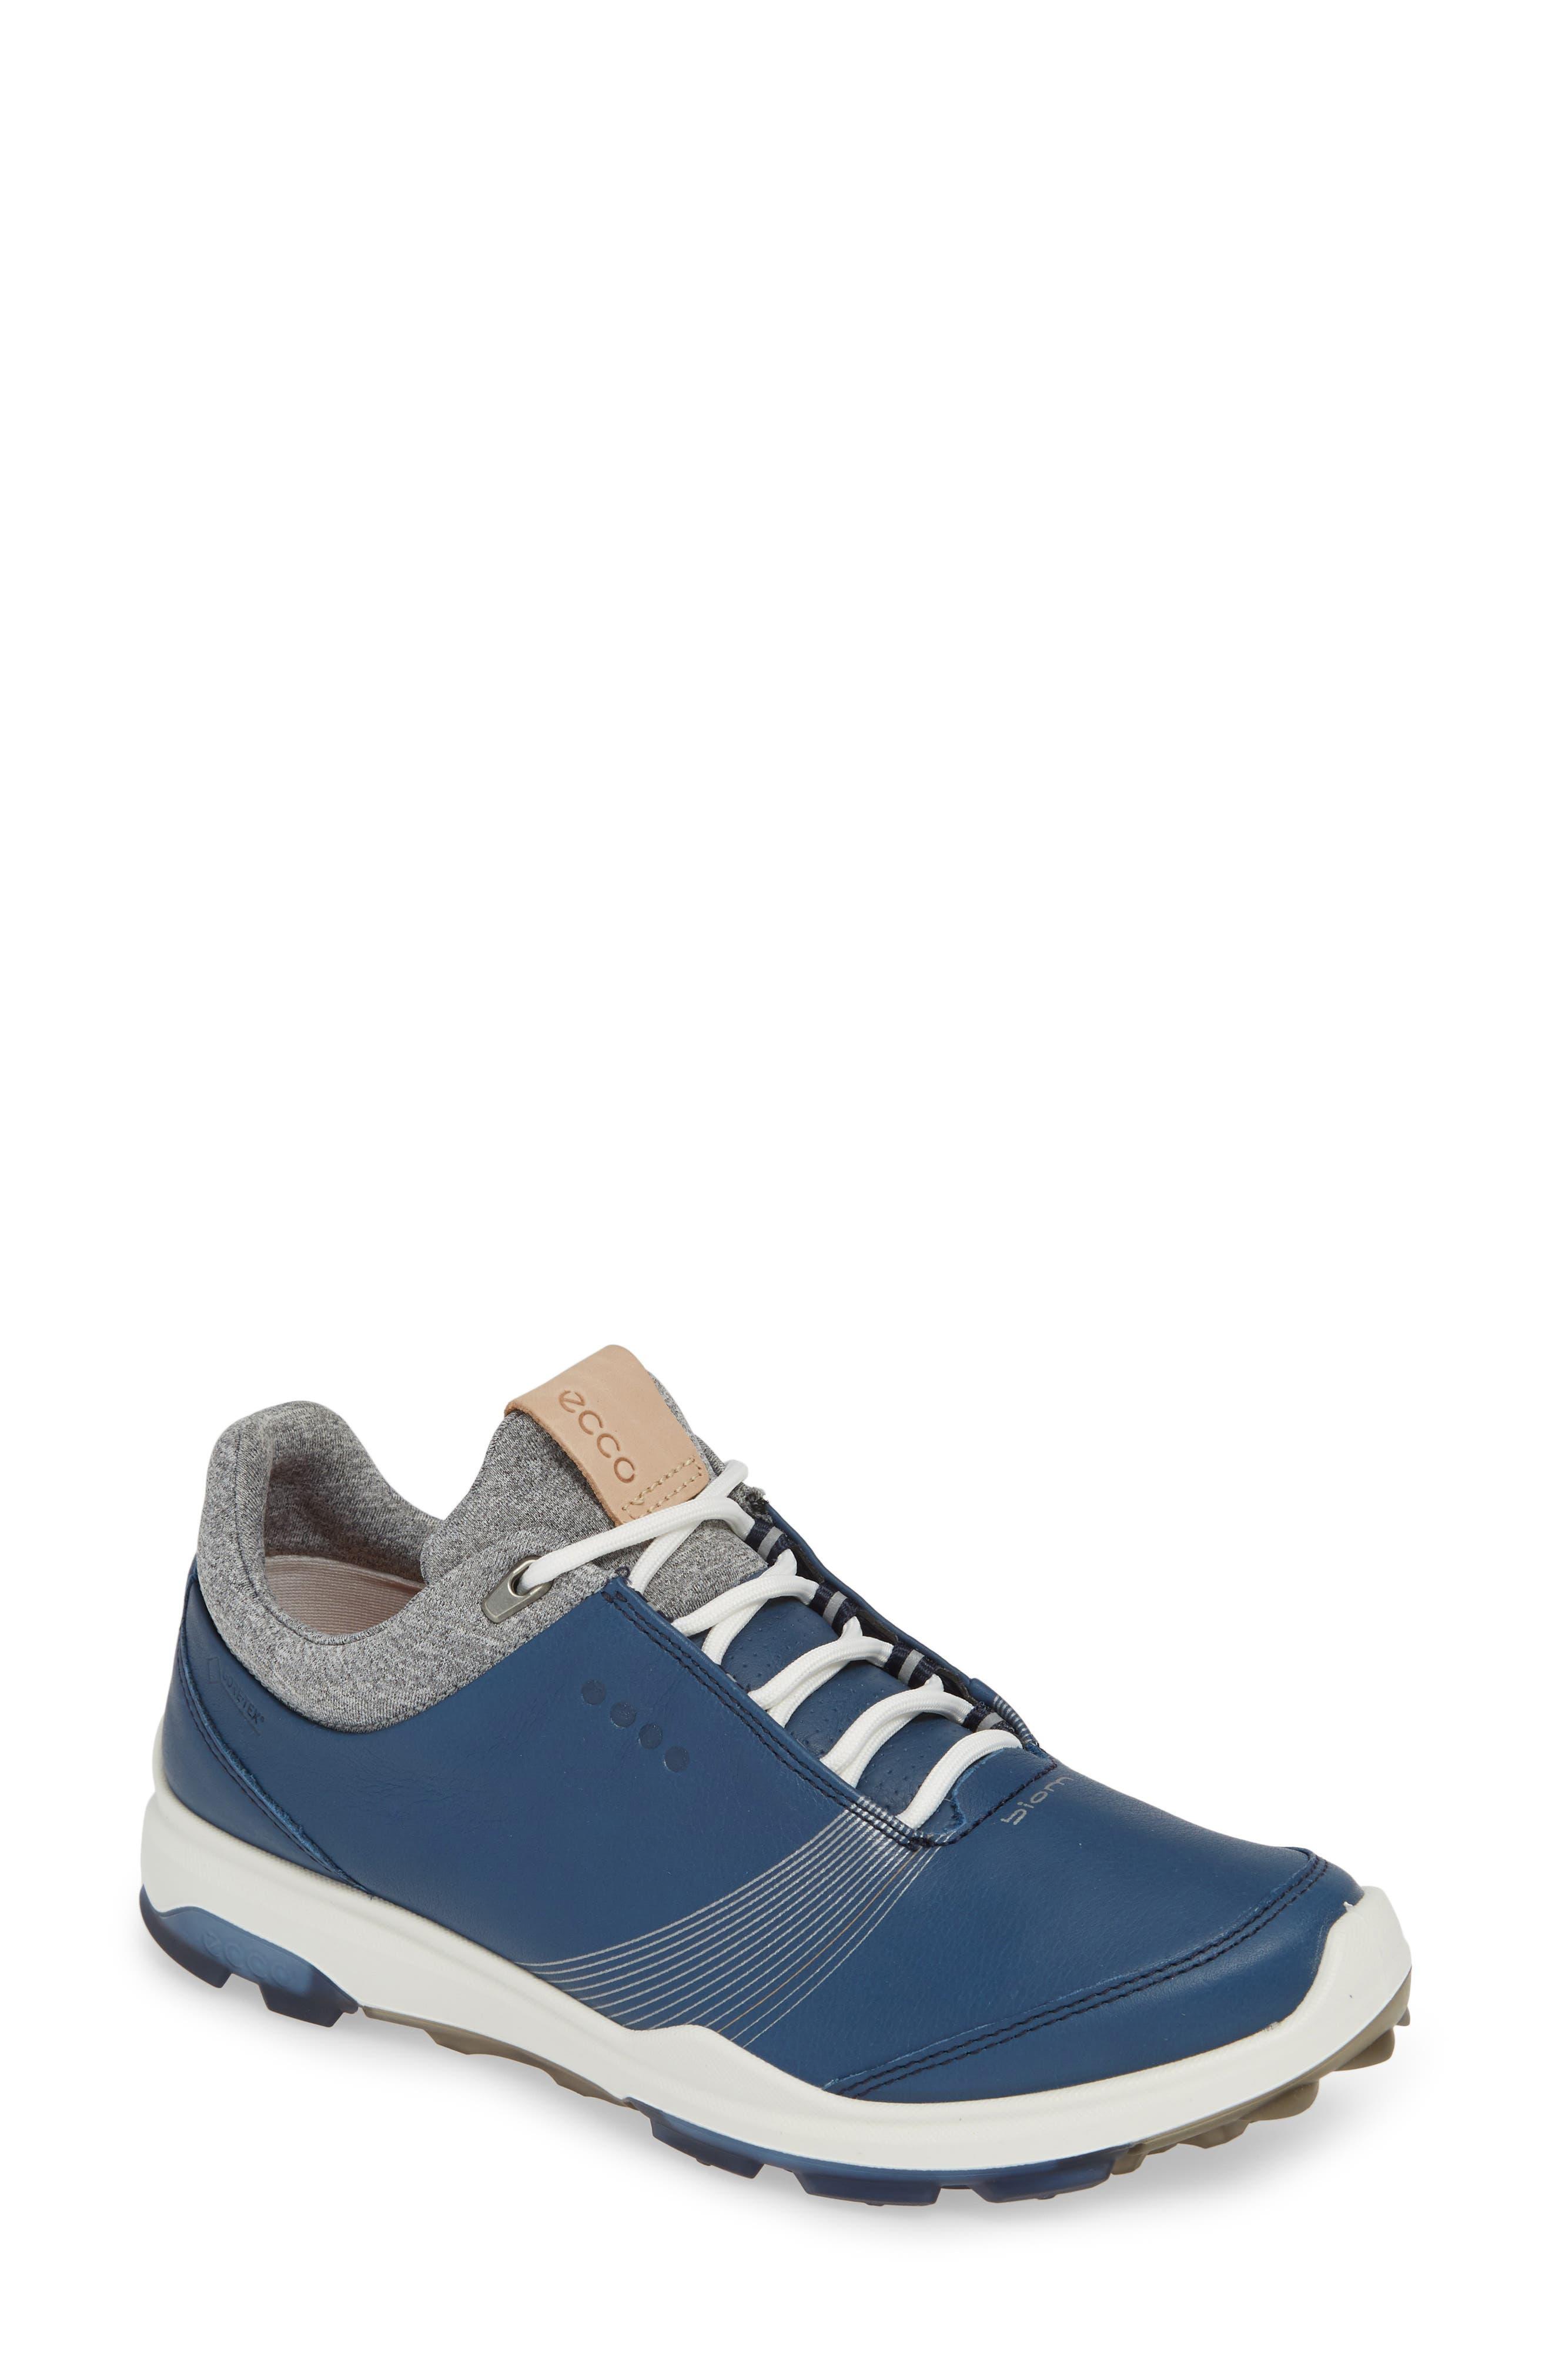 Ecco Biom Hybrid 3 Gtx Golf Shoe, Blue